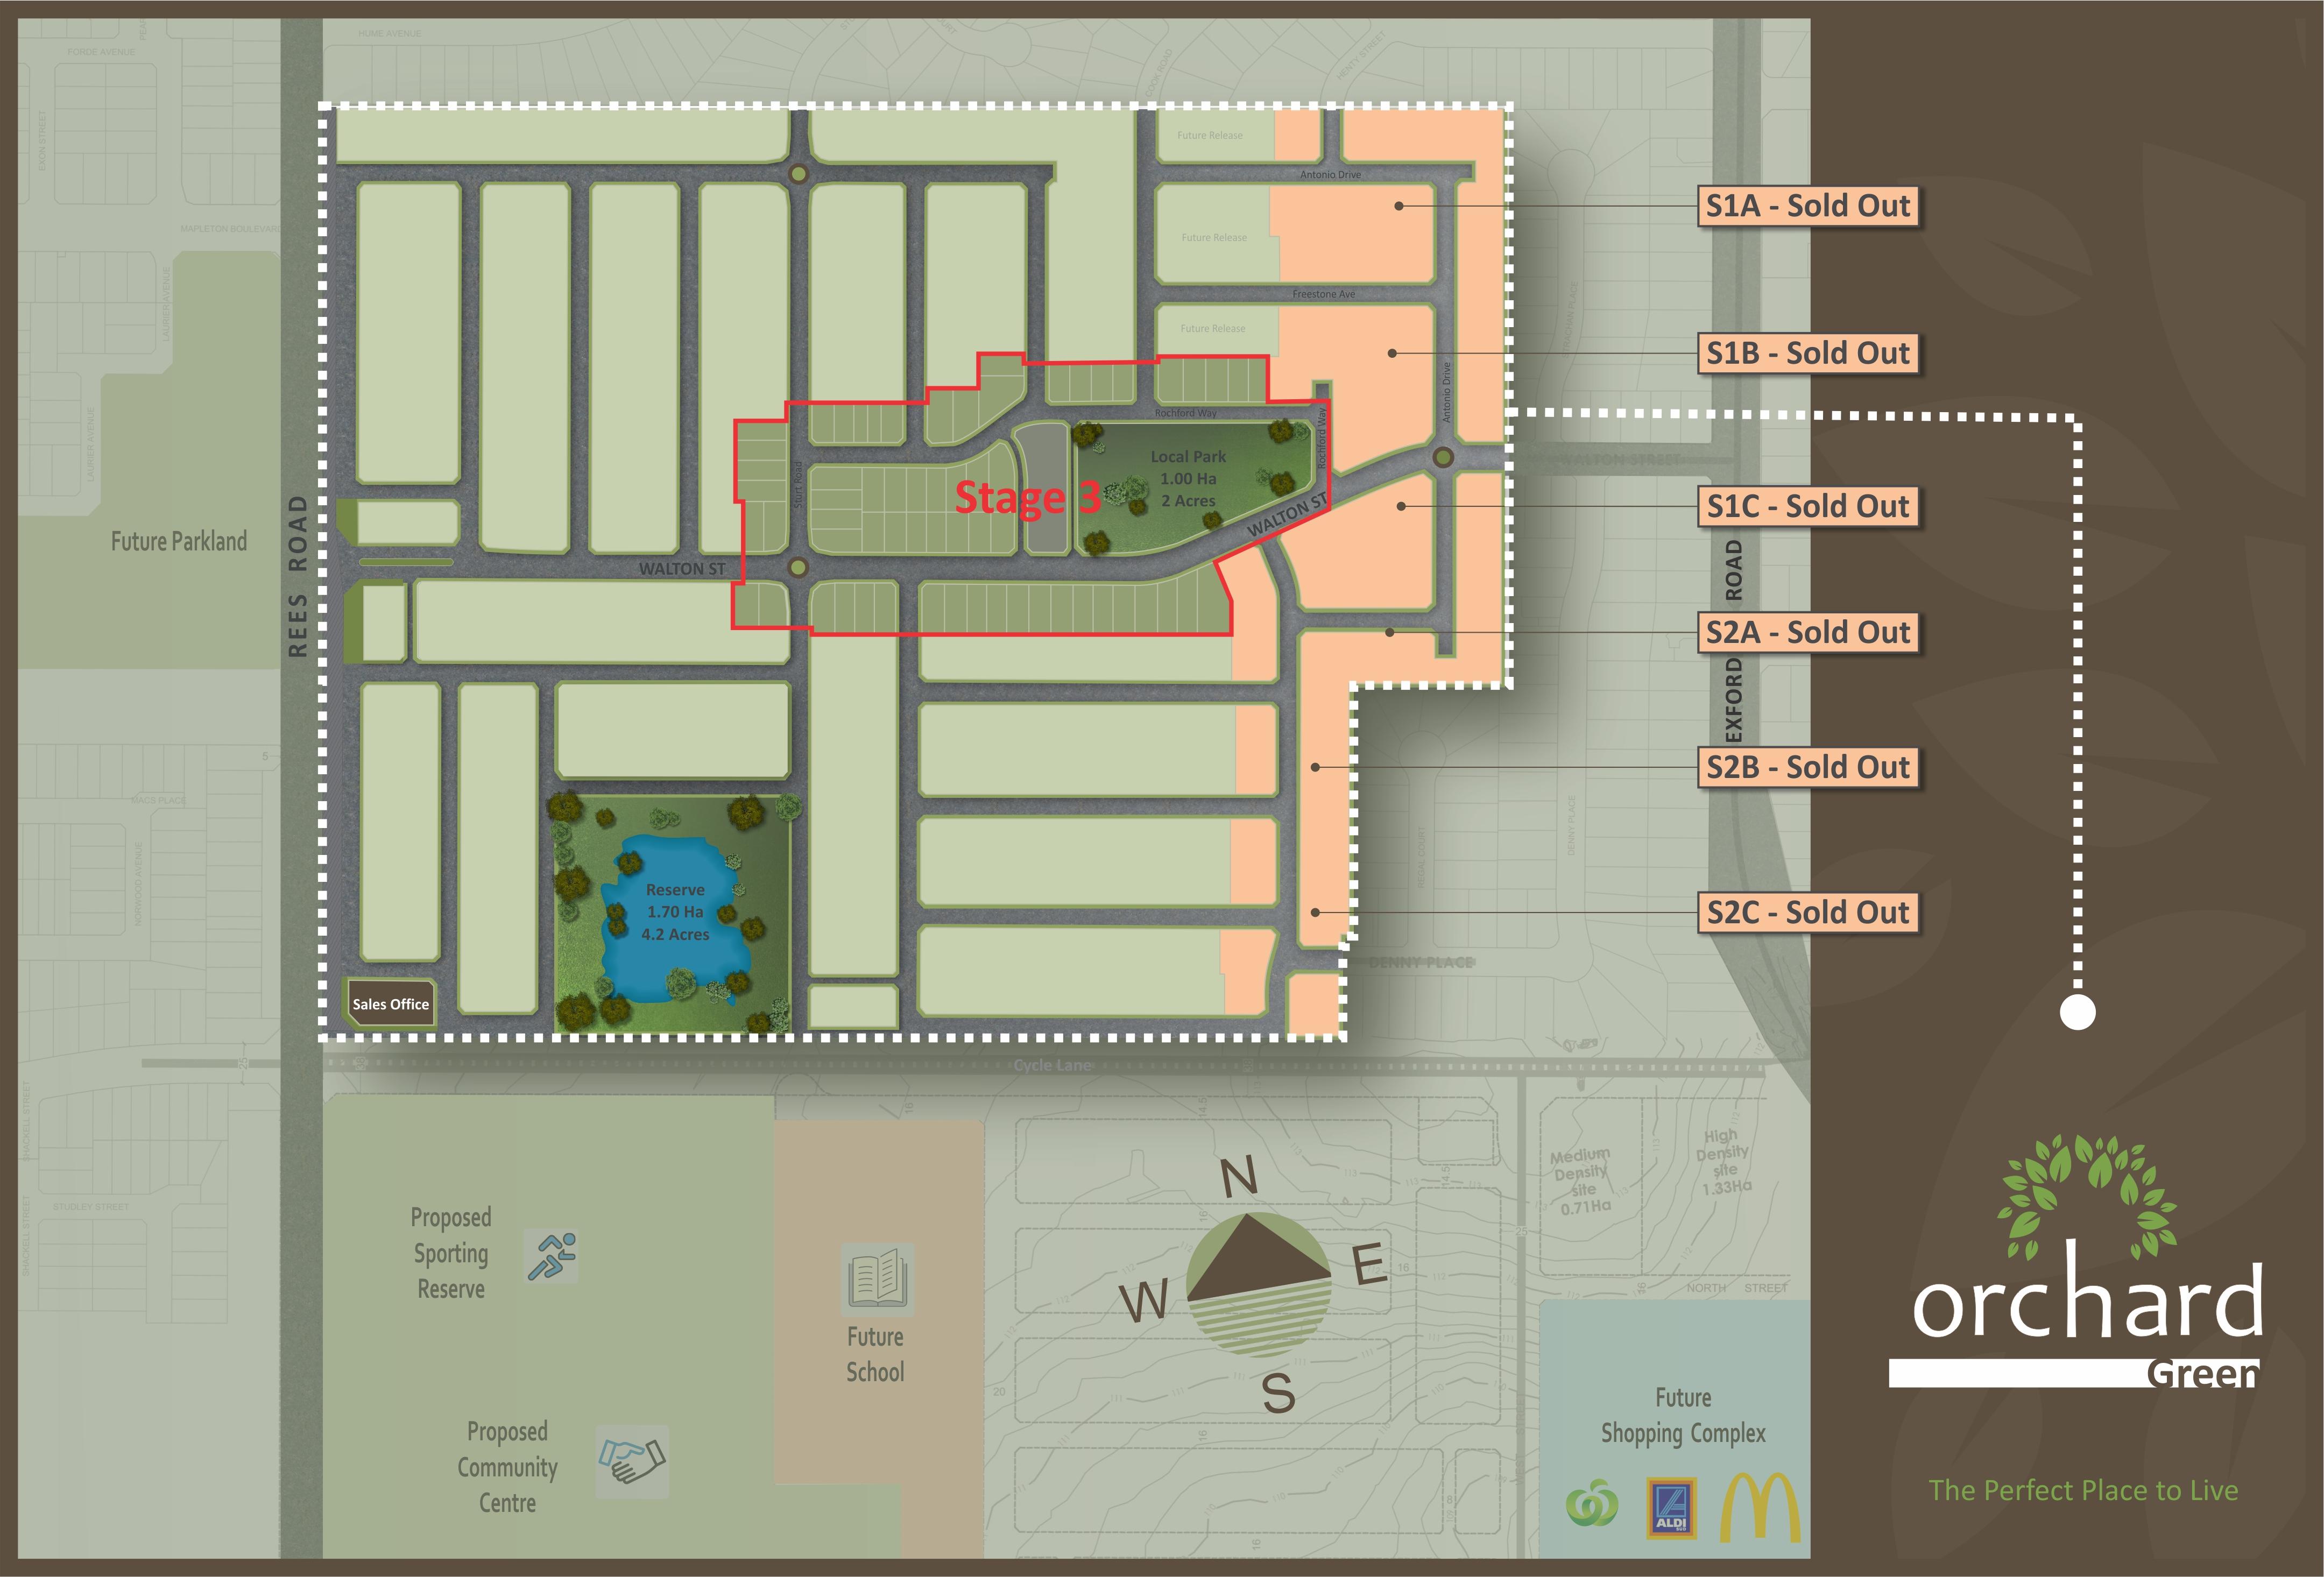 Orchard Green Master Plan